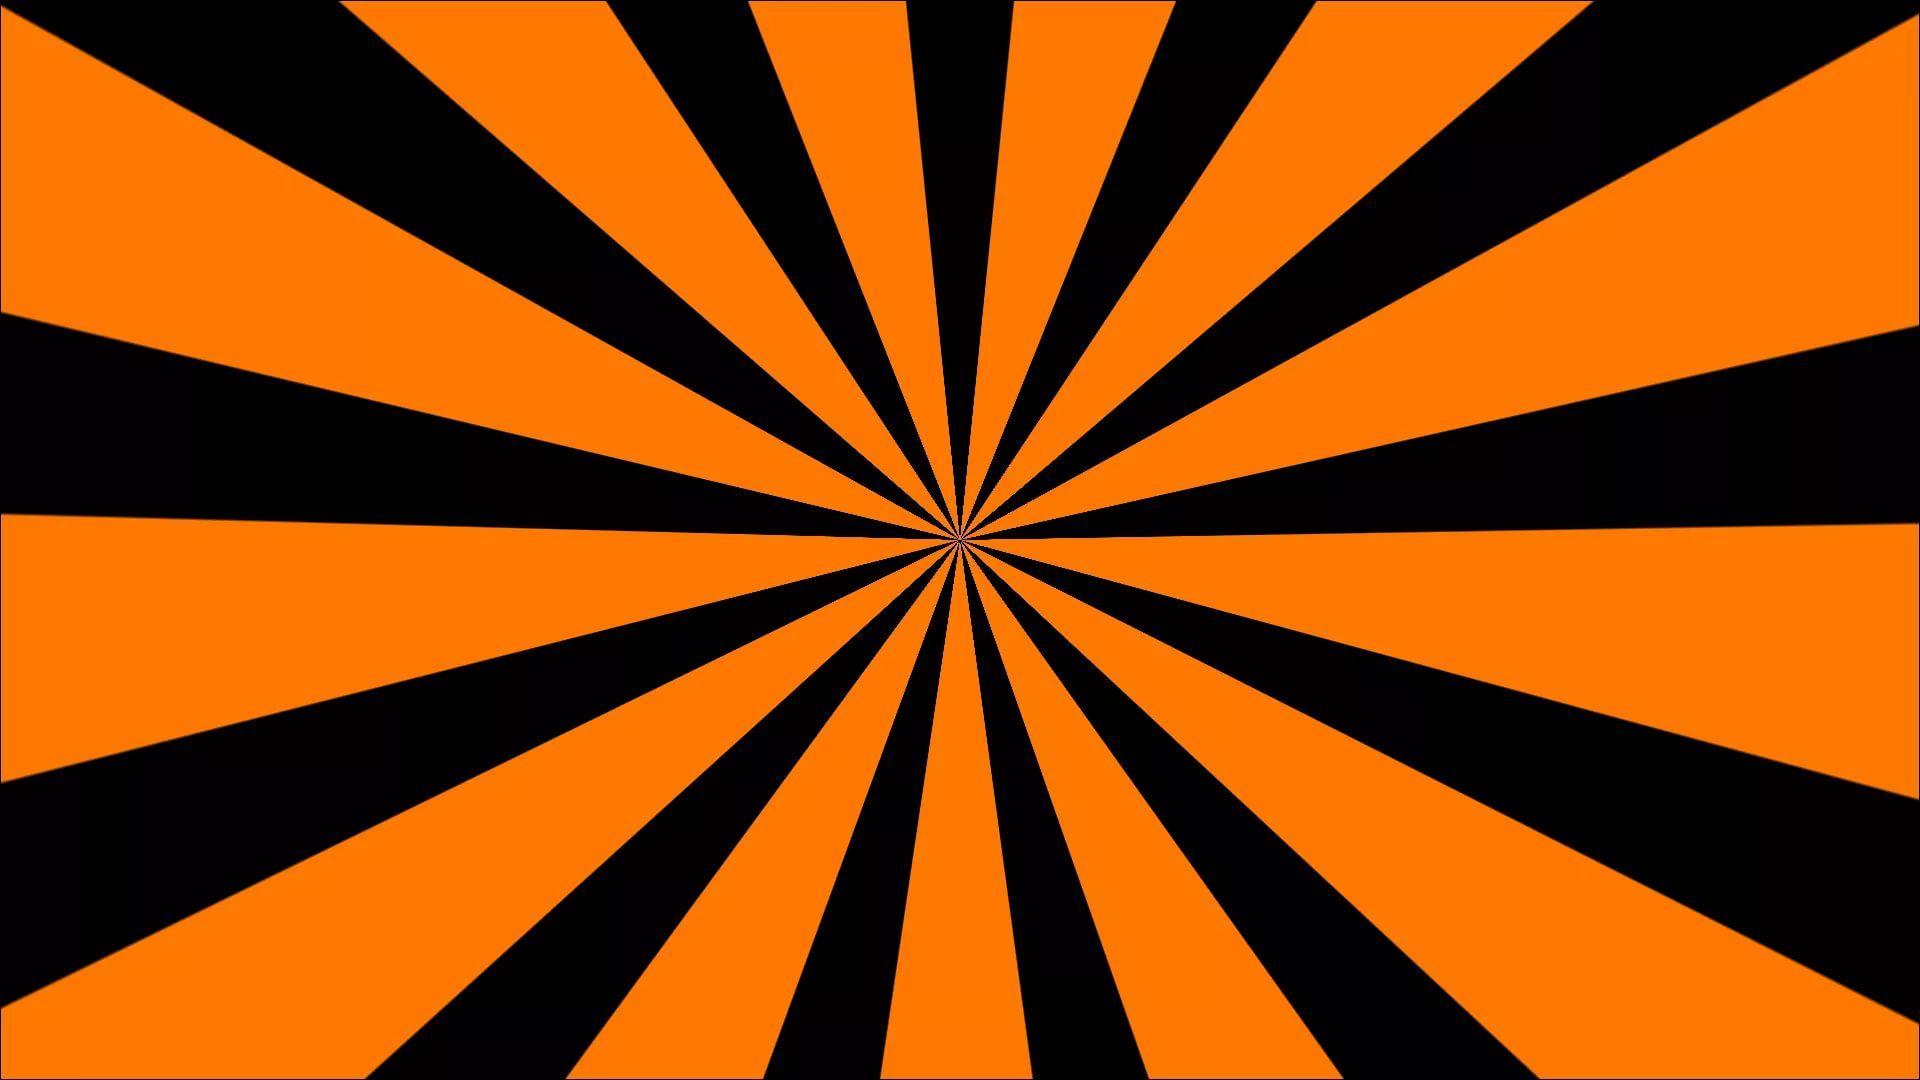 Black And Orange Background Wallpaper HD